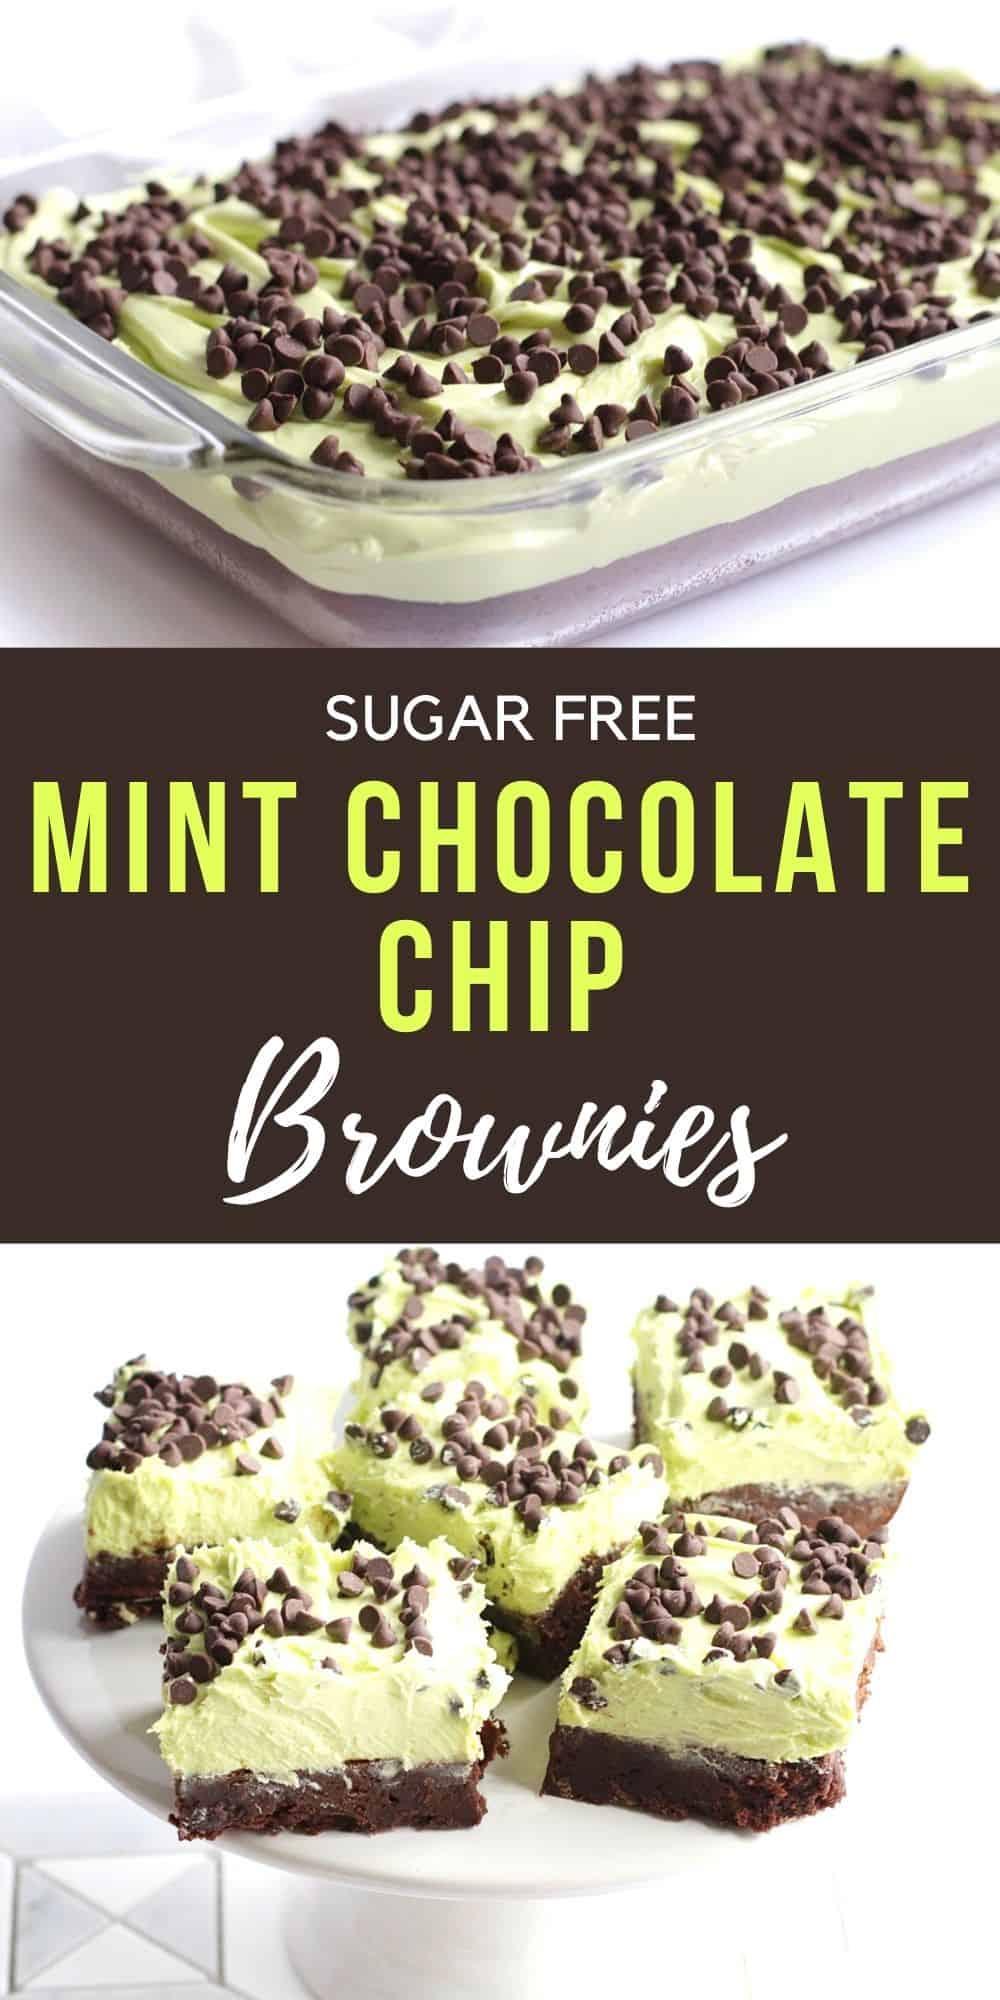 Sugar Free Mint Chocolate Chip Brownies